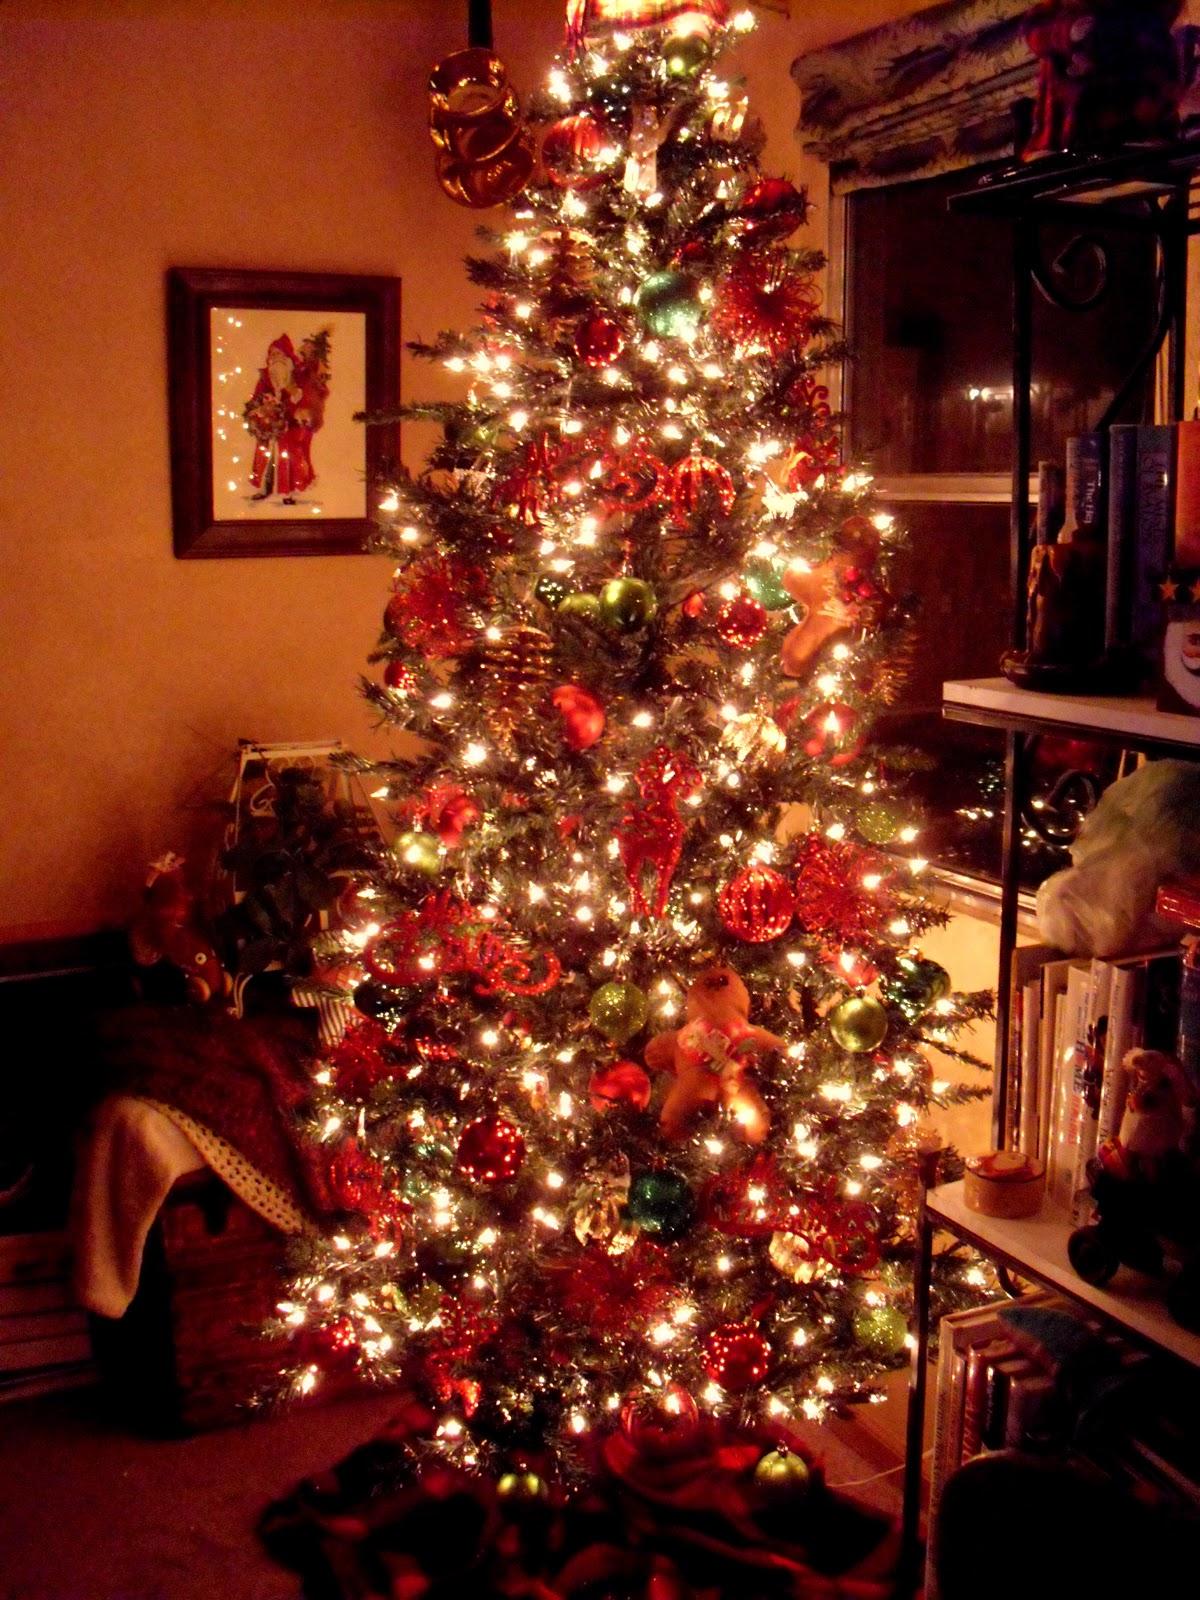 My Primitive Nest: Decorating the Christmas Tree